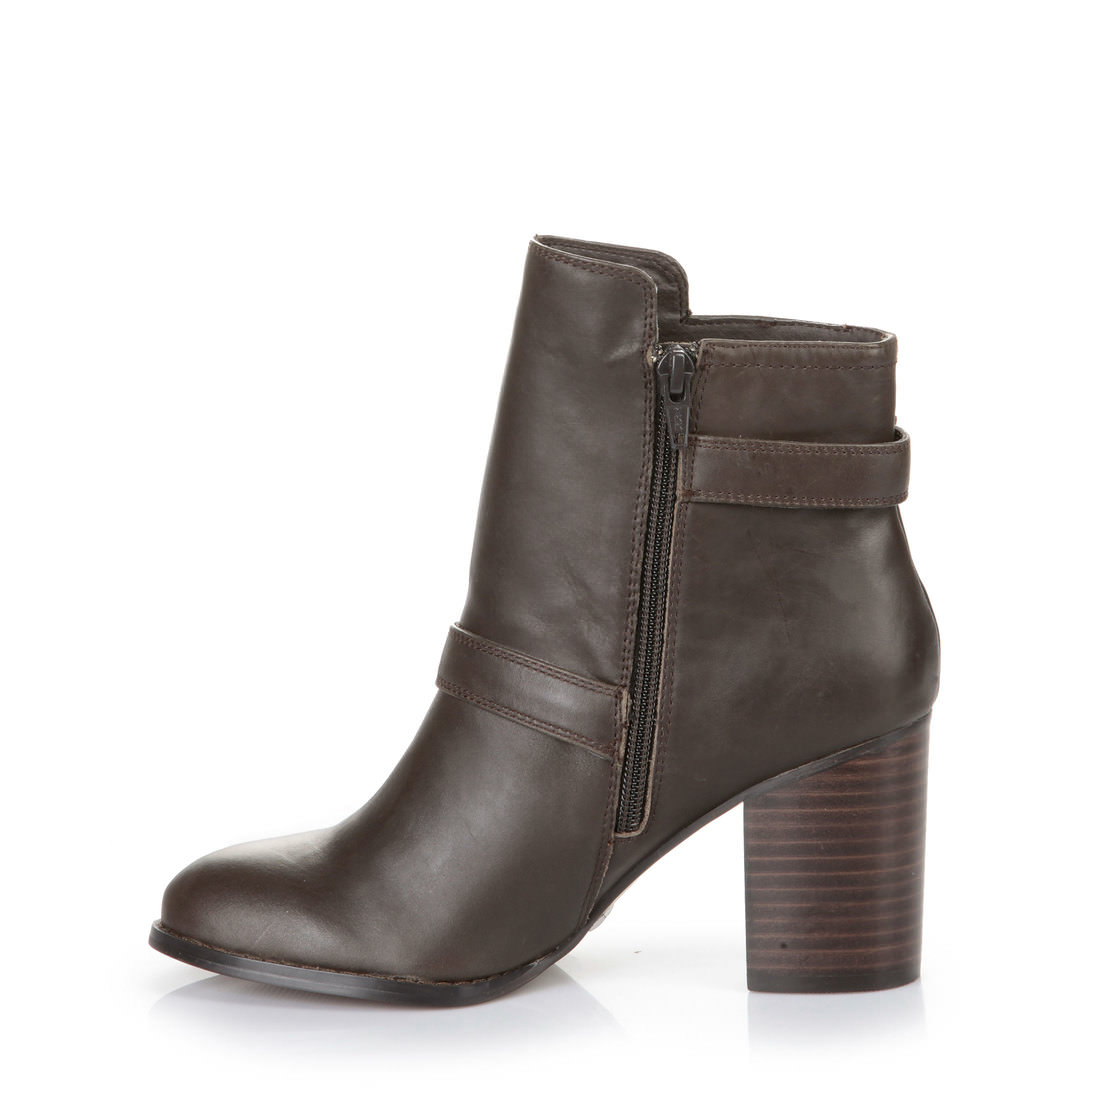 buffalo ankle boots in dark brown buy online in buffalo online shop buffalo. Black Bedroom Furniture Sets. Home Design Ideas